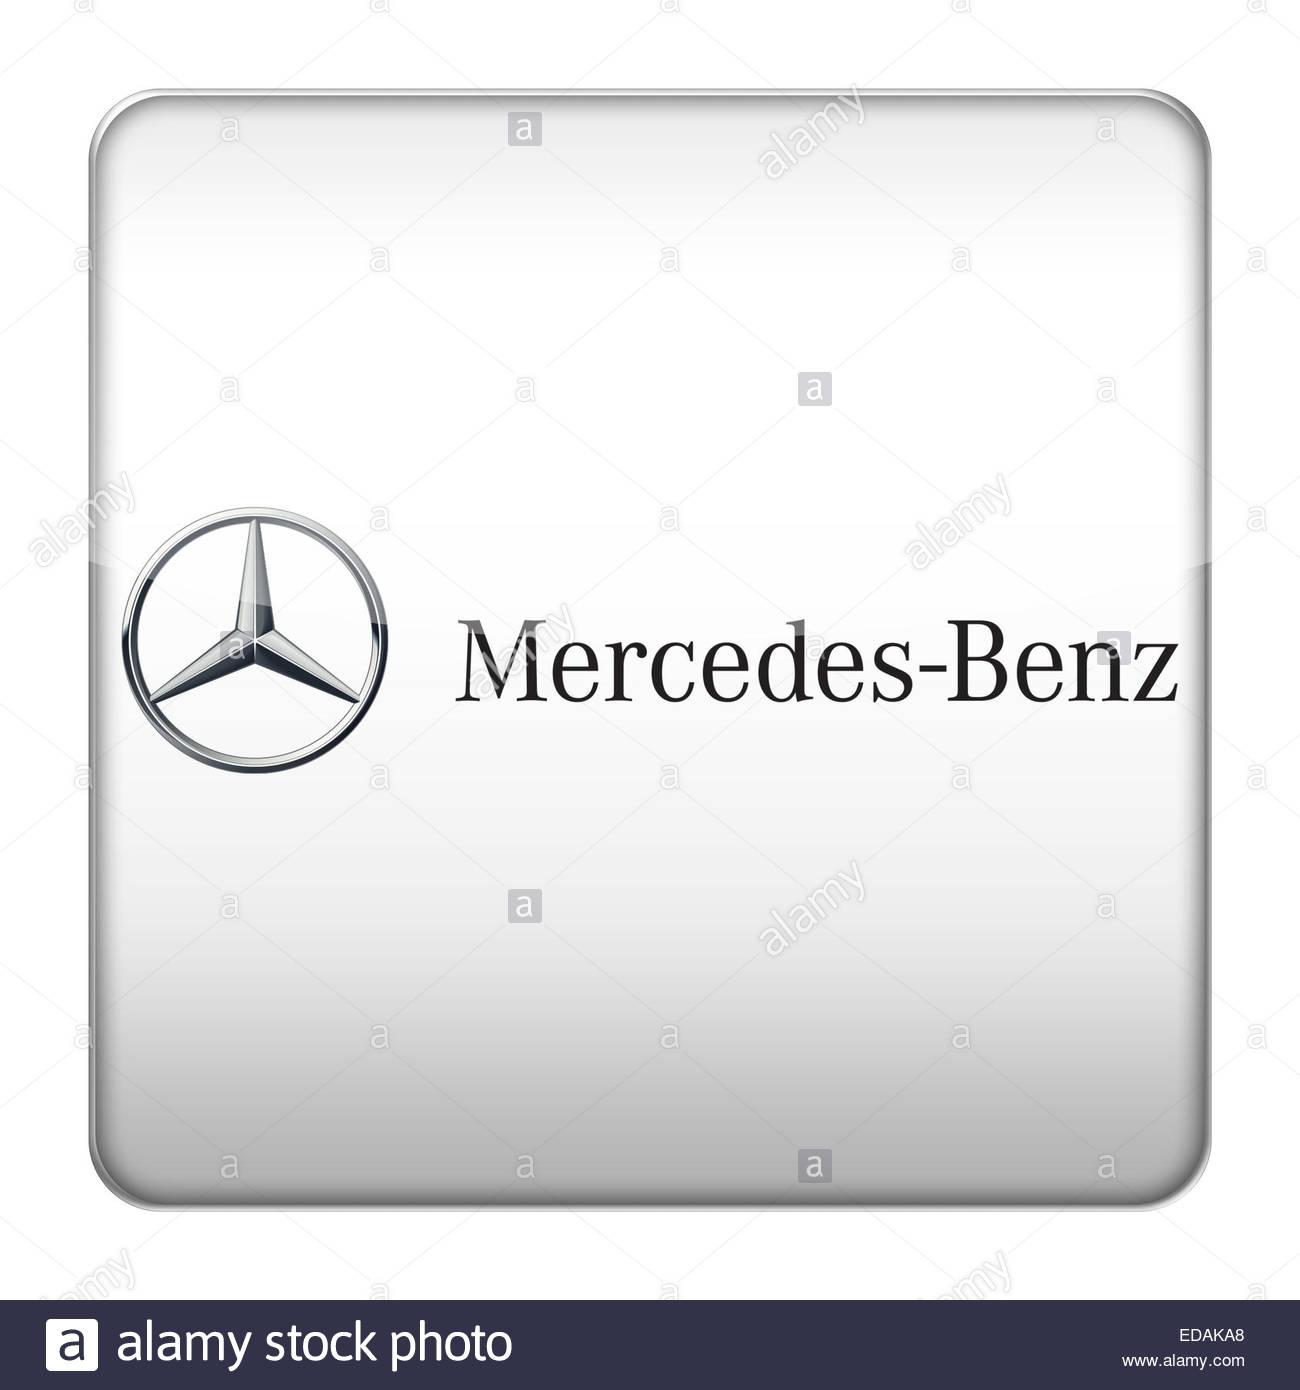 Mercedes Benz logo icon - Stock Image